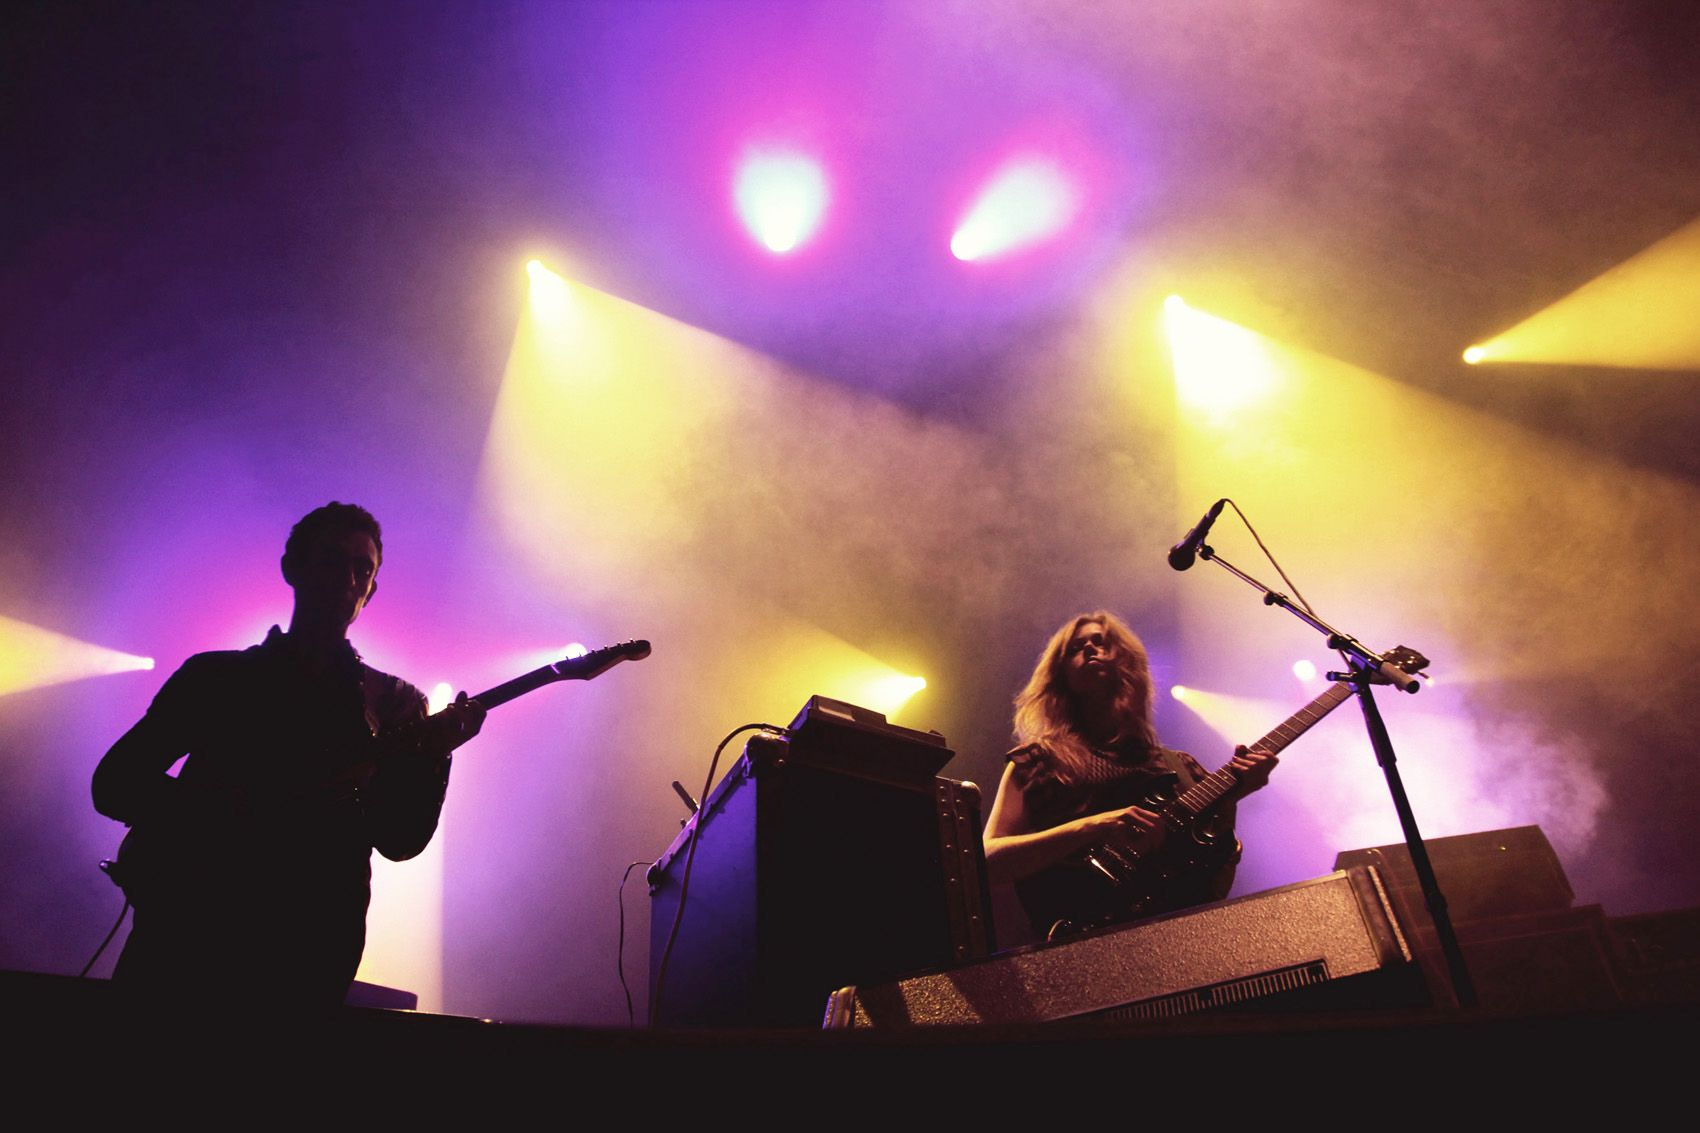 chromatics - primavera sound 2012 pitchfork